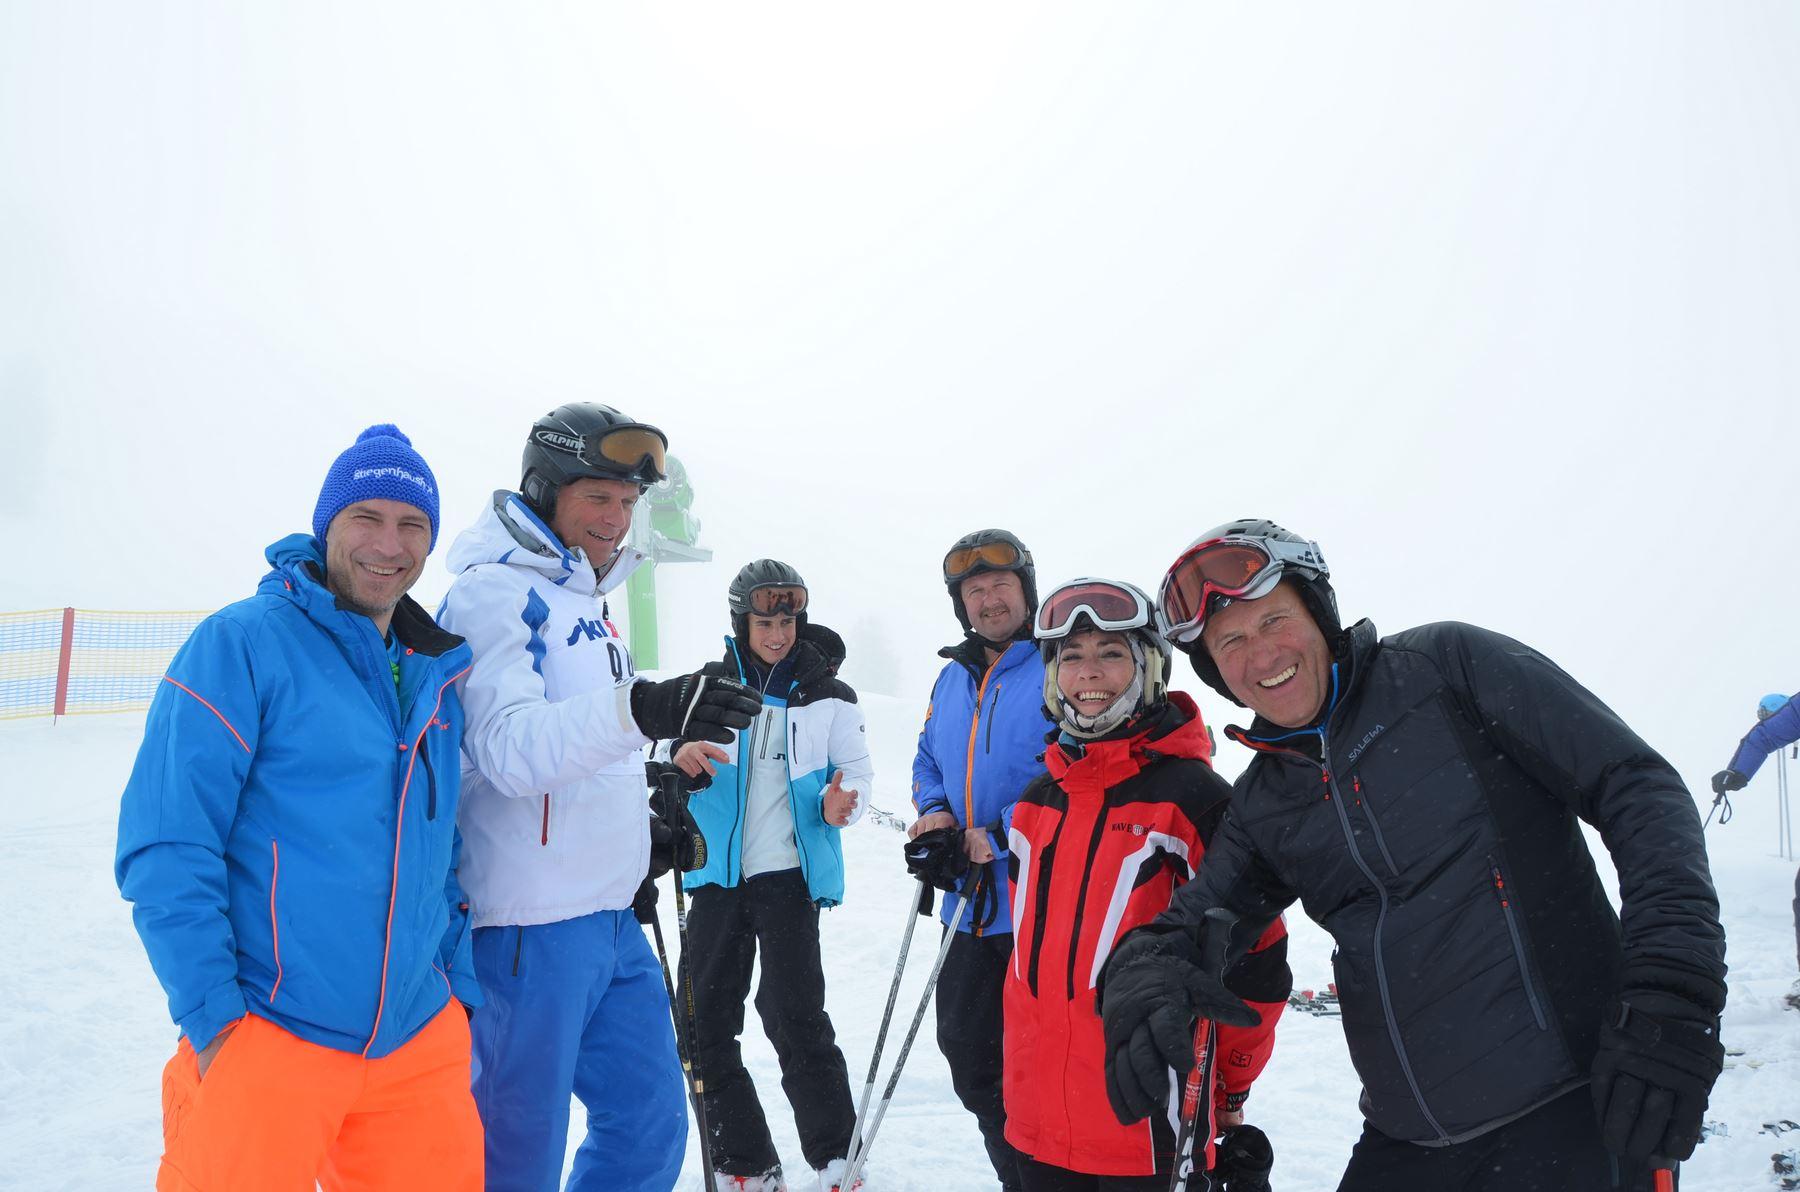 2015-03-22 BV Zillertal Skirennen 064.JPG